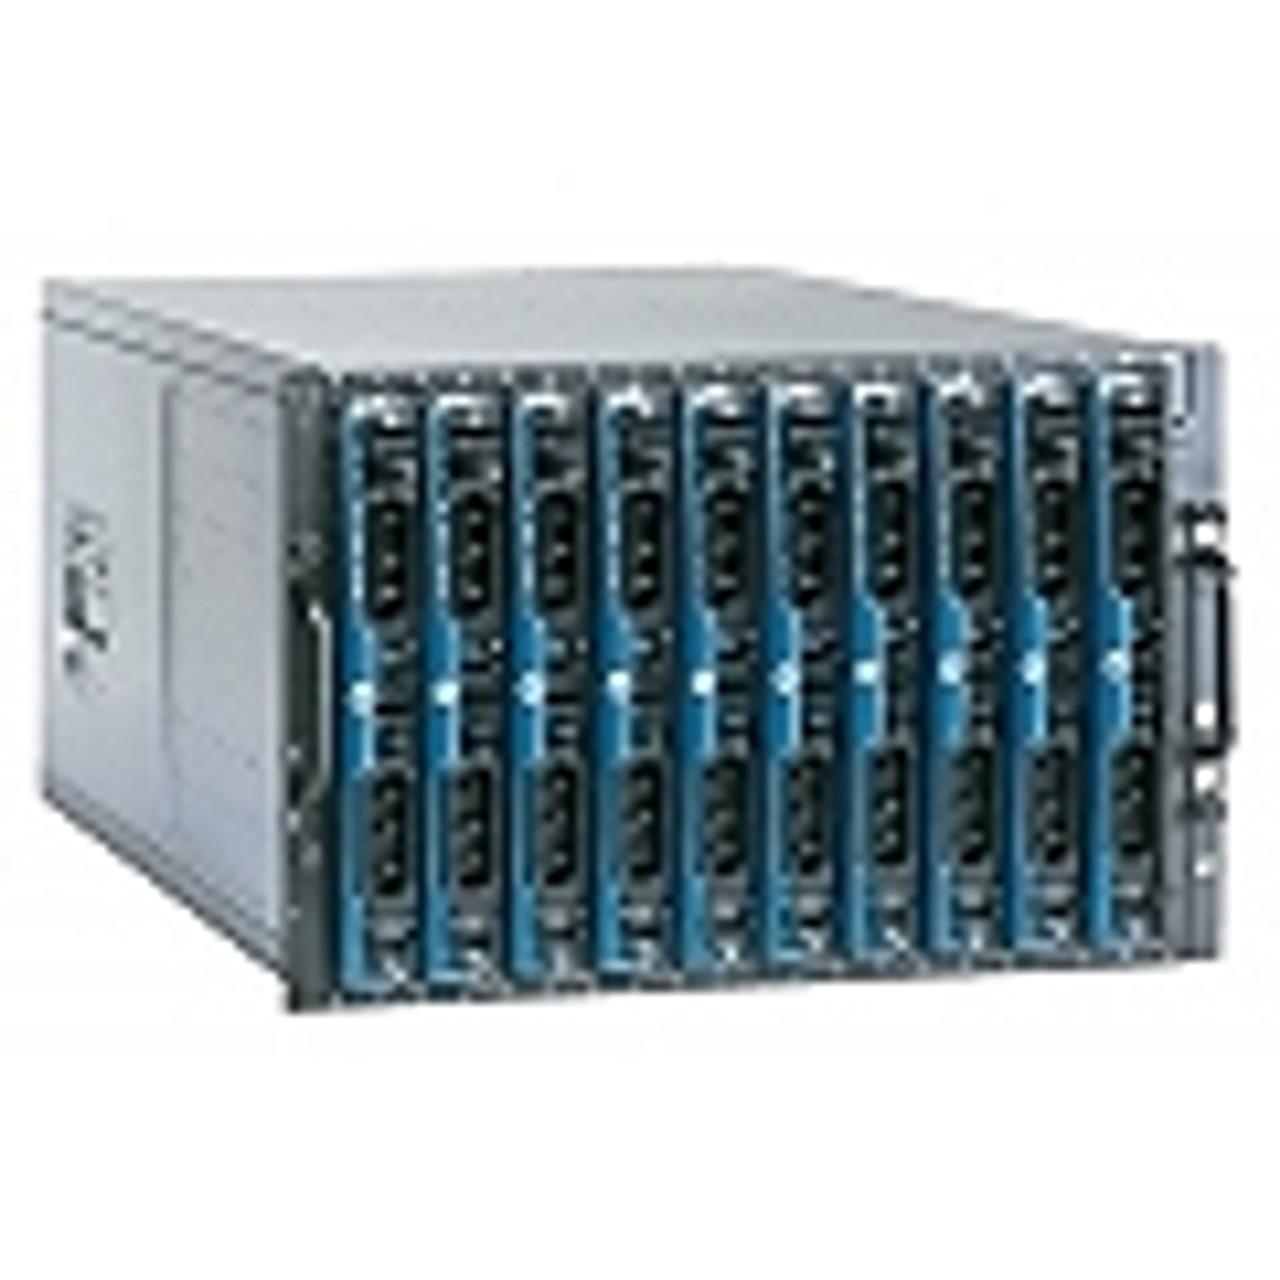 Dell PowerEdge 1855 Blade Servers